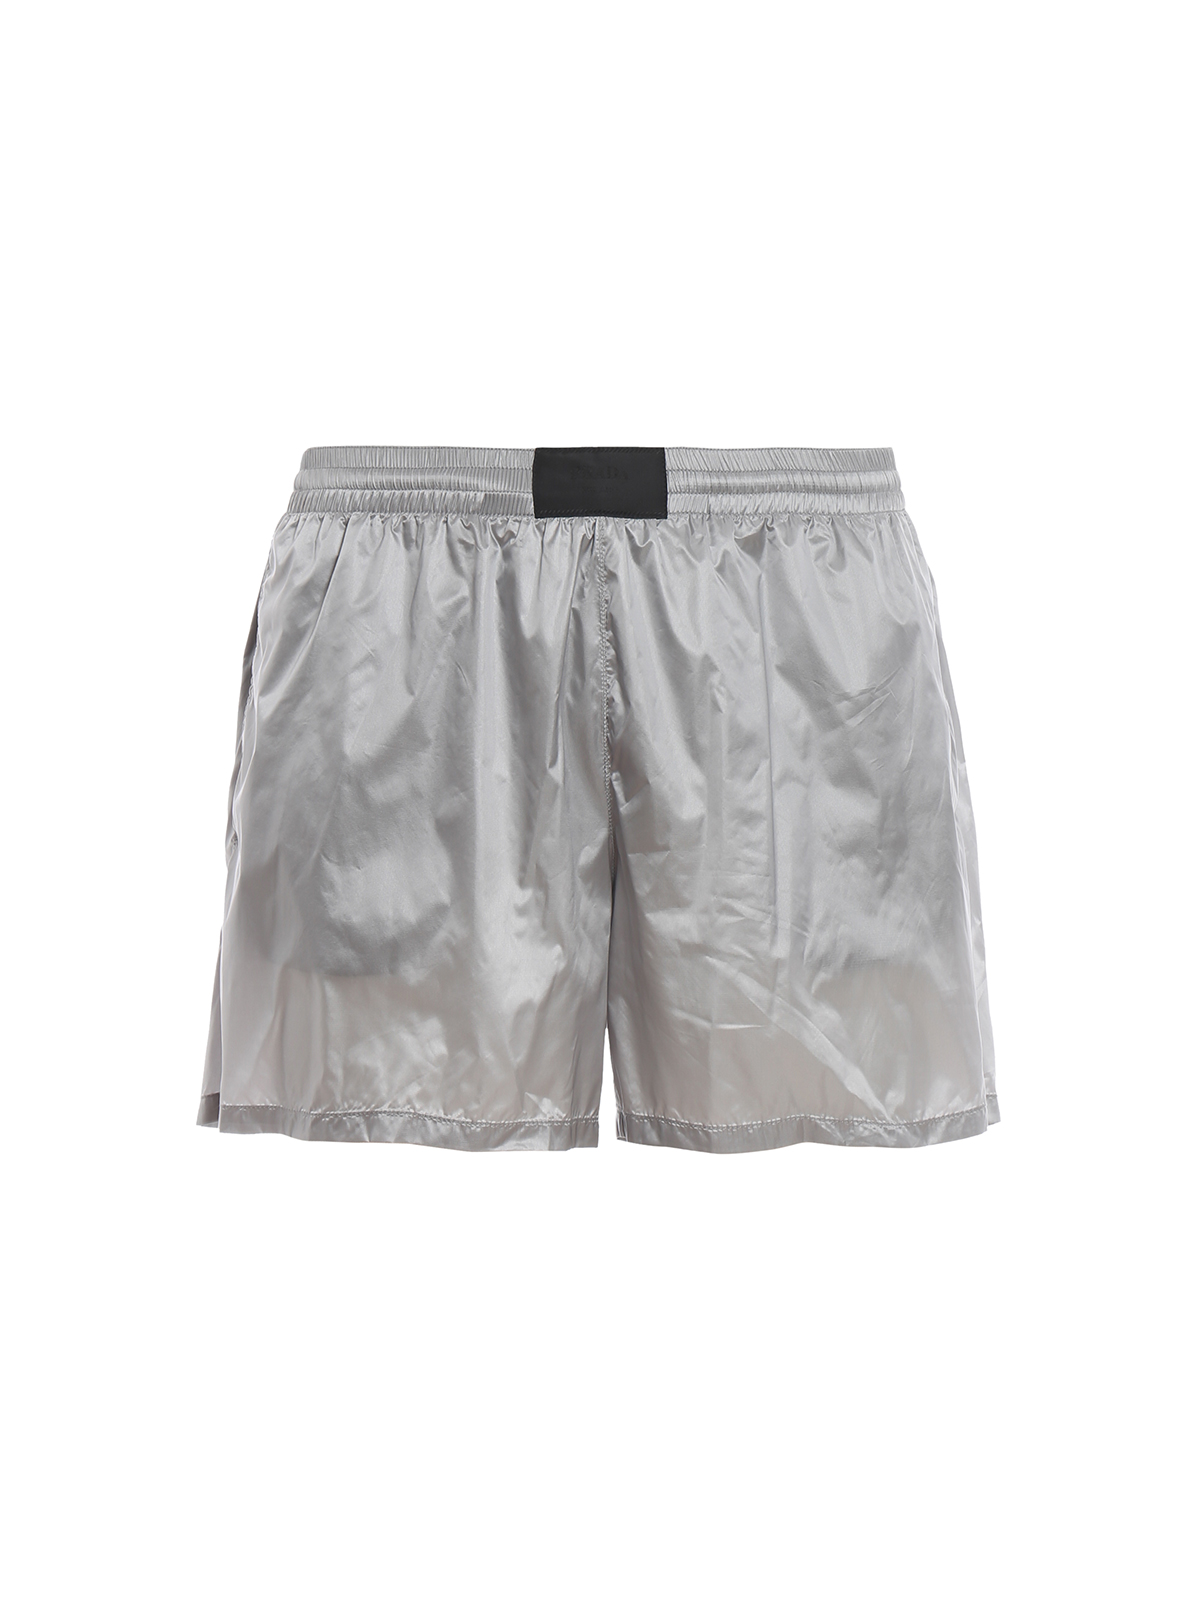 081a844810984 PRADA: Swim shorts & swimming trunks - Microristop nylon swim shorts